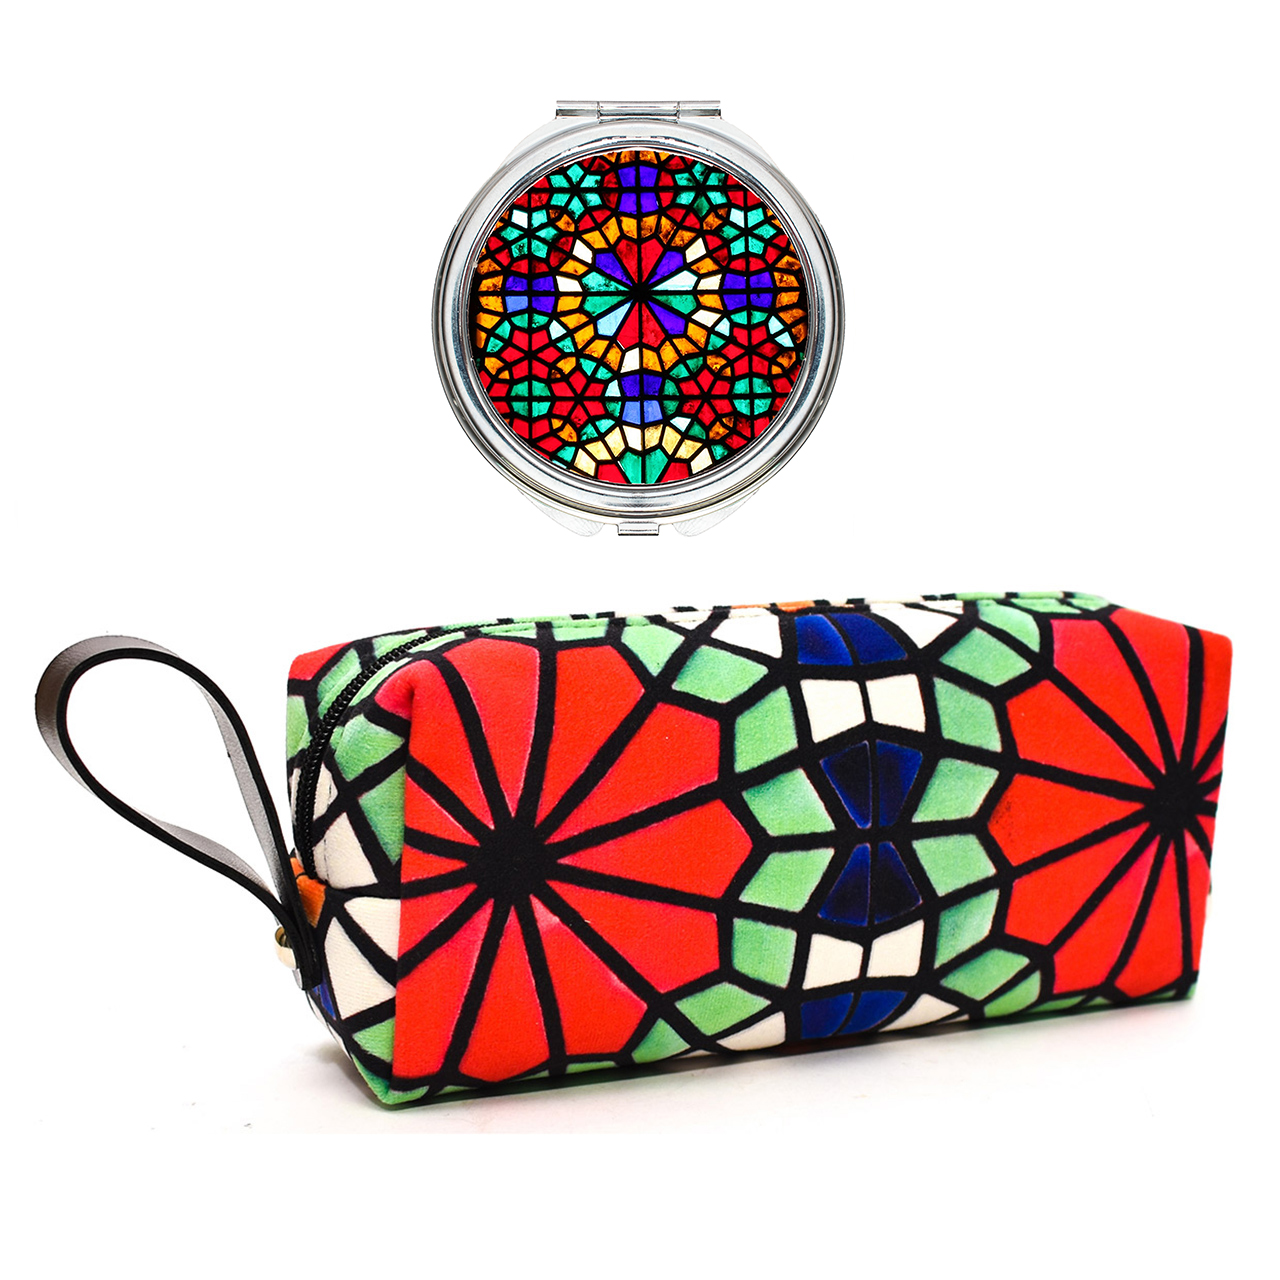 قیمت پک کیف و آینه آرایشی لومانا کد 011